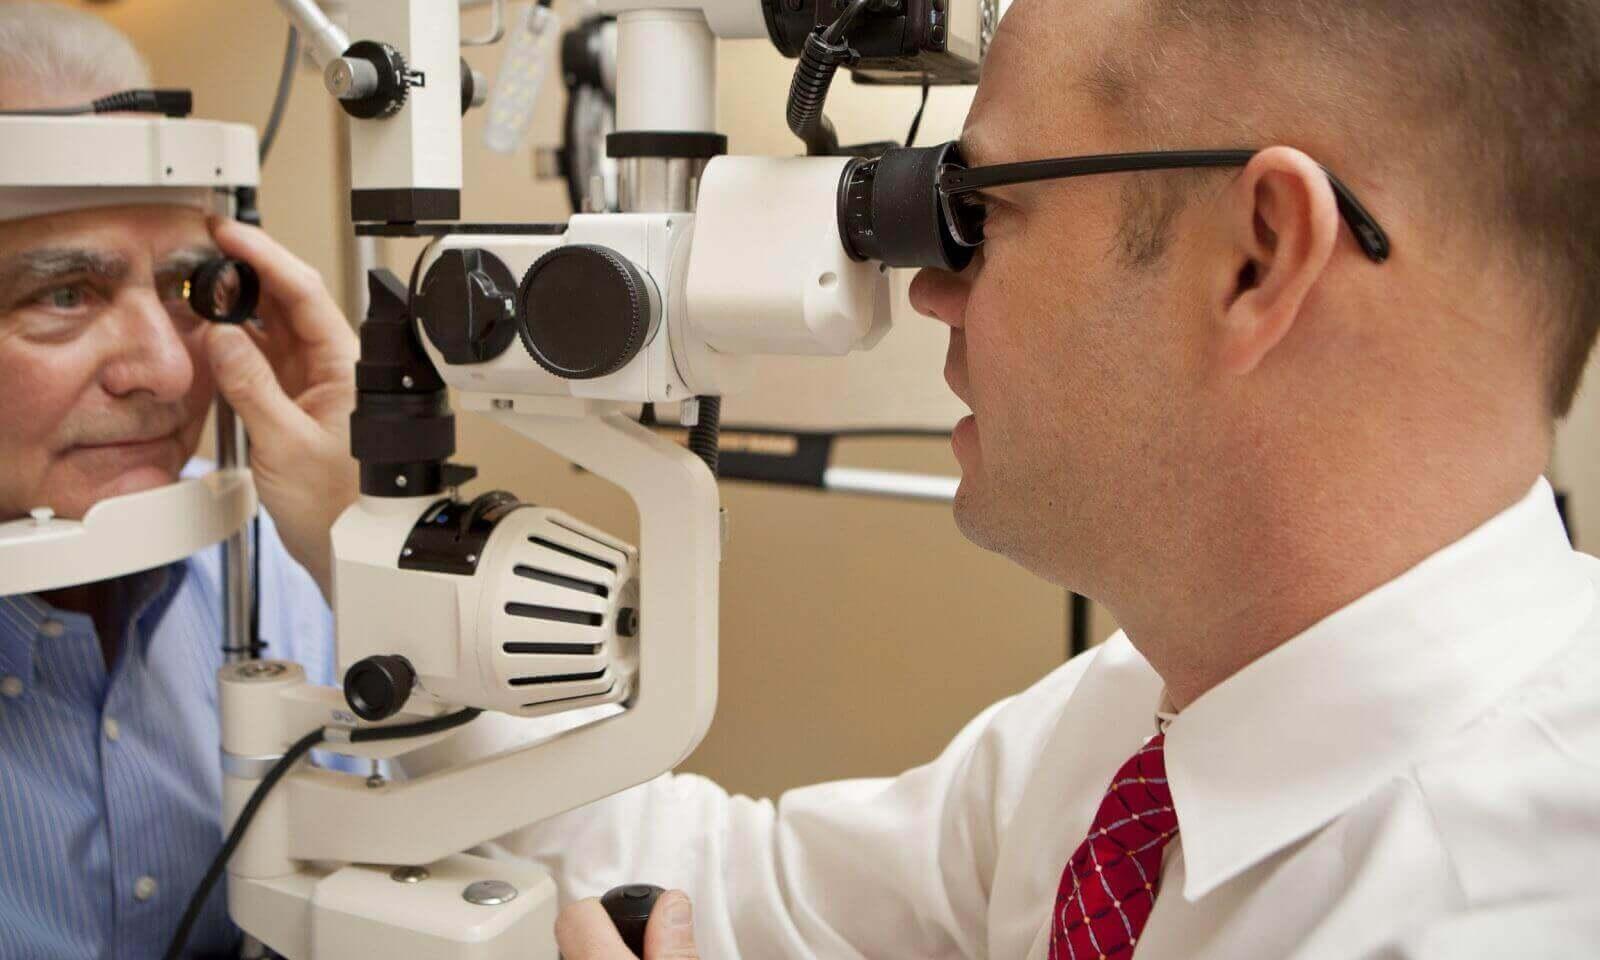 oftalmologista 24 horas sp gratuito